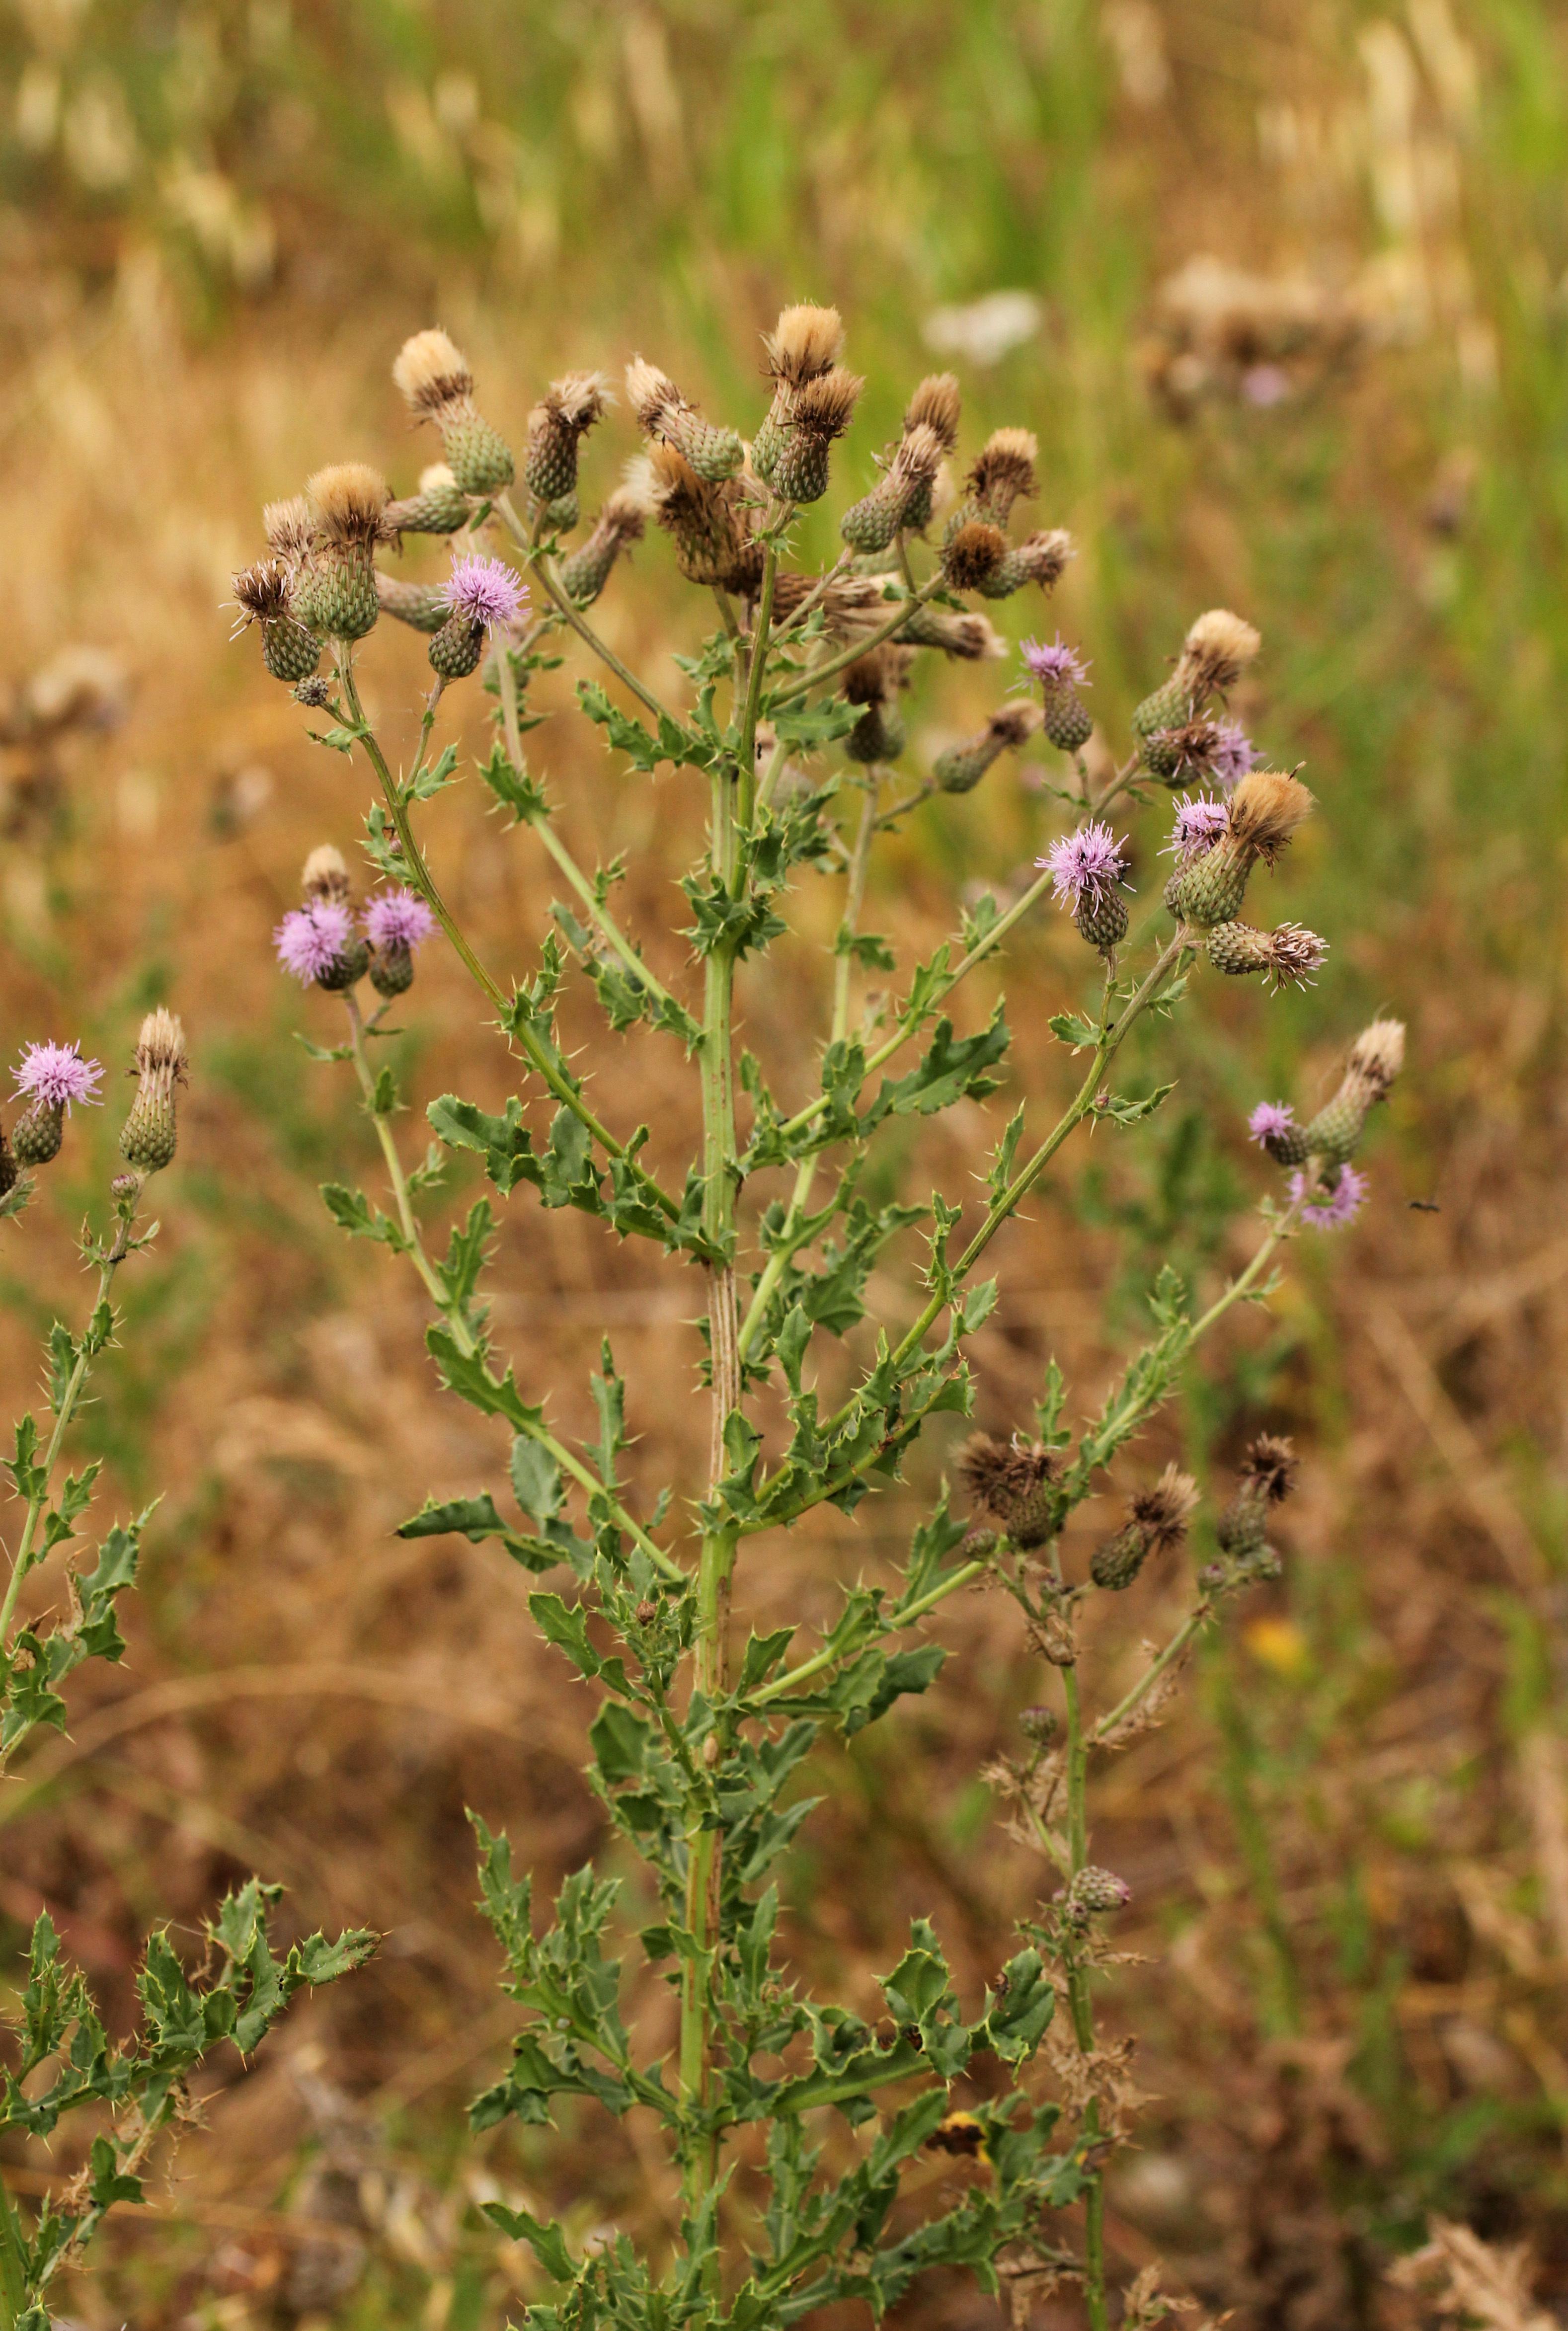 http://api.tela-botanica.org/img:000148434O.jpg